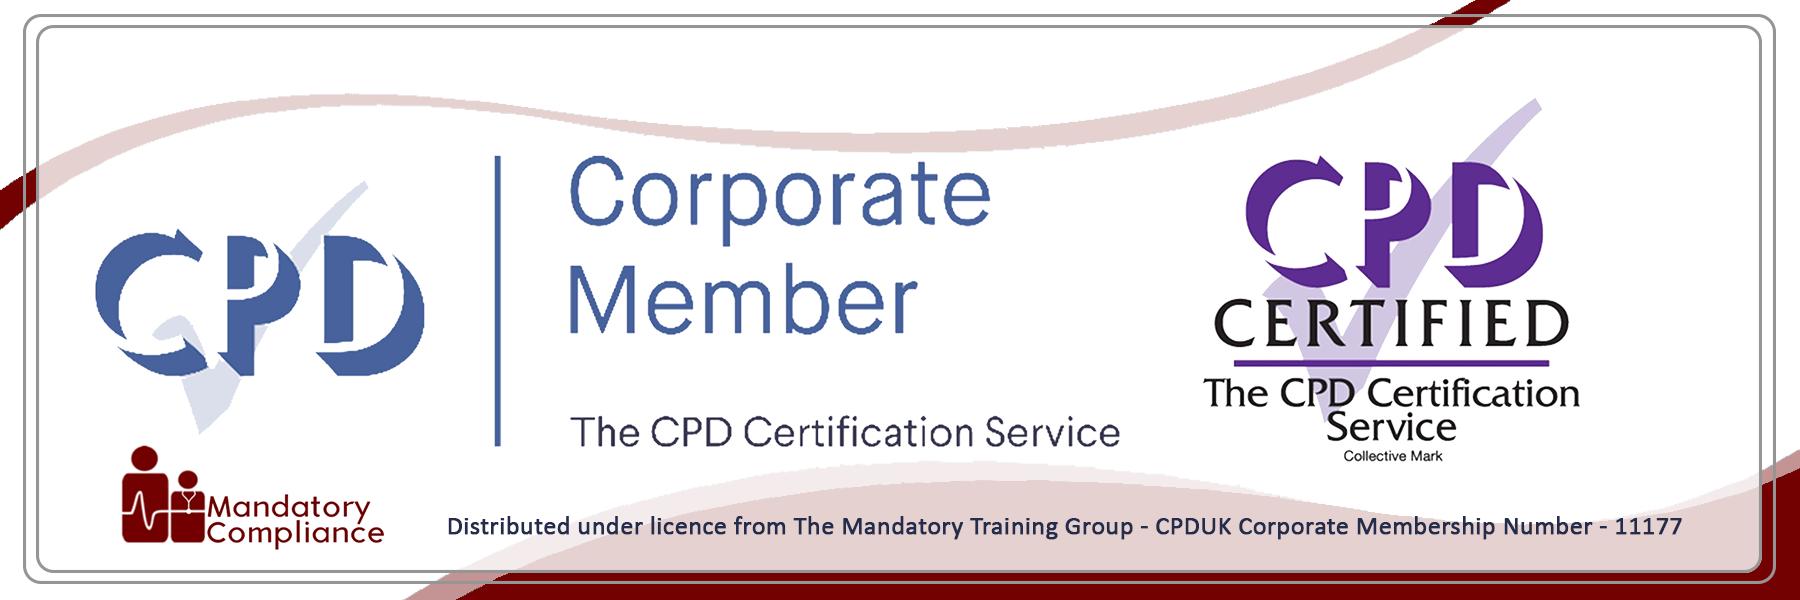 Moving and Handling - Online Training Courses - Mandatory Compliance UK-